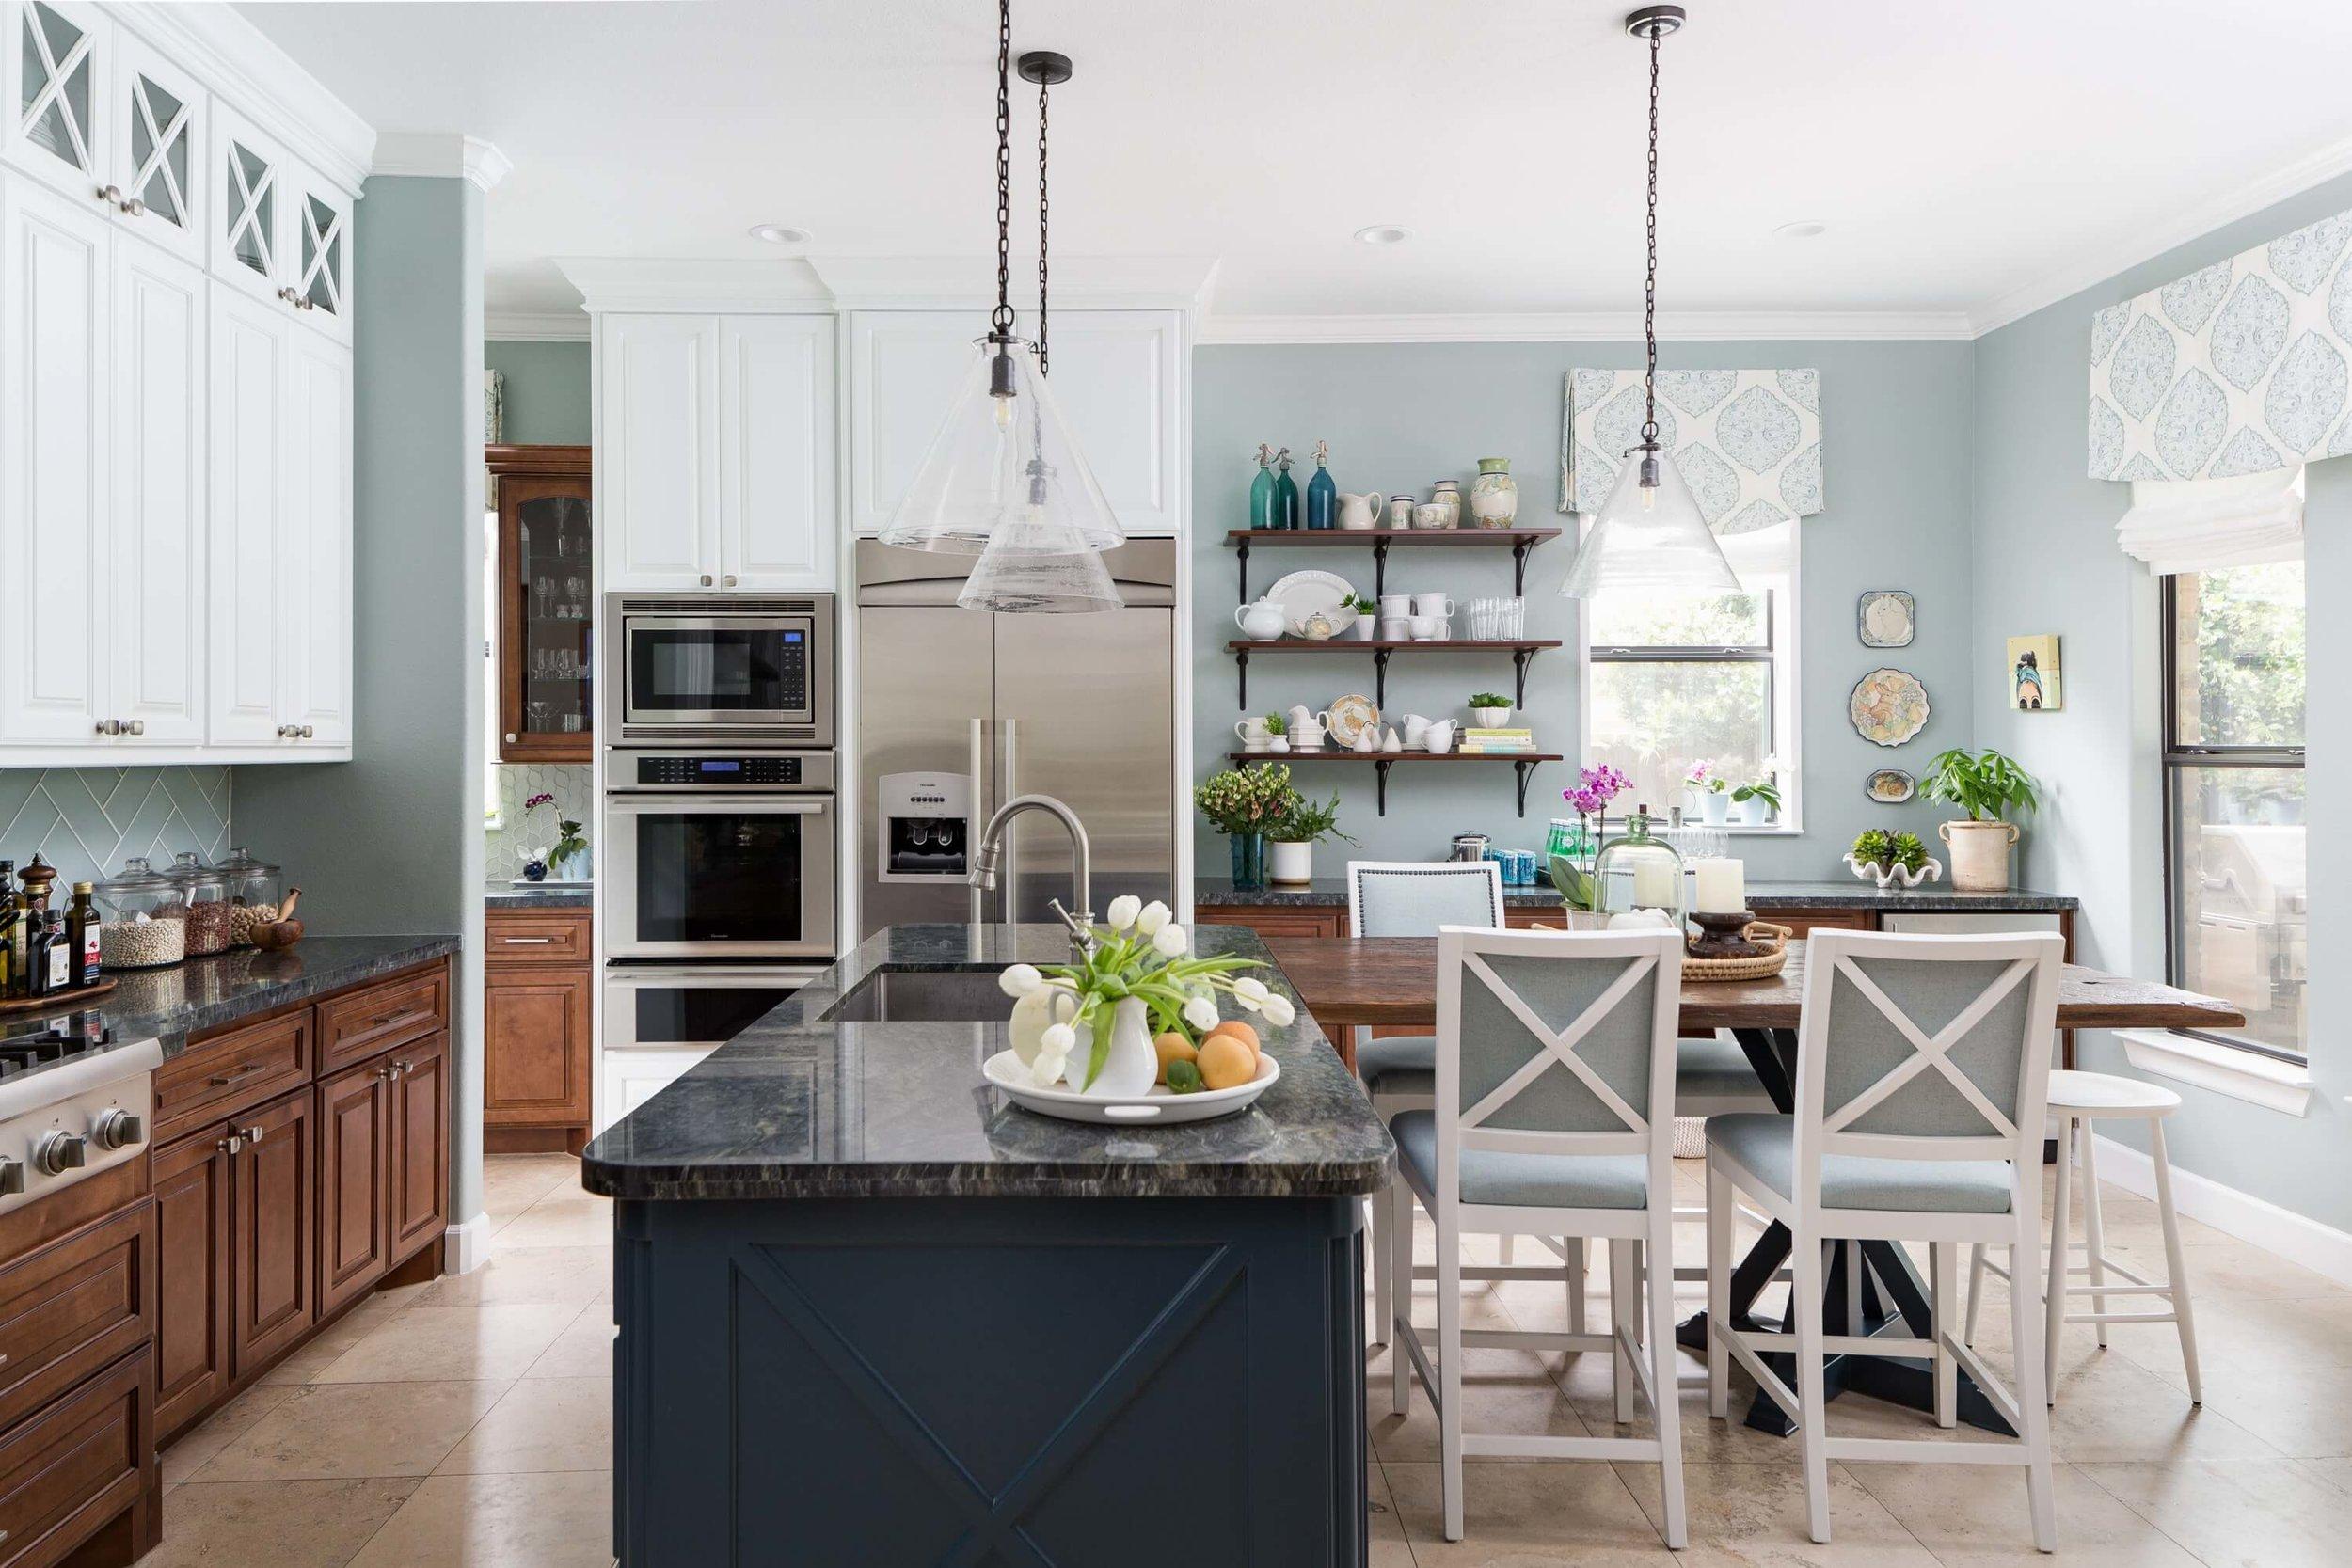 Coastal style kitchen makeover w/ open shelves and reclaimed wood countertop - Carla Aston, Designer | Colleen Scott, Photographer | #turquoisekitchen #coastalkitchen #openshelves